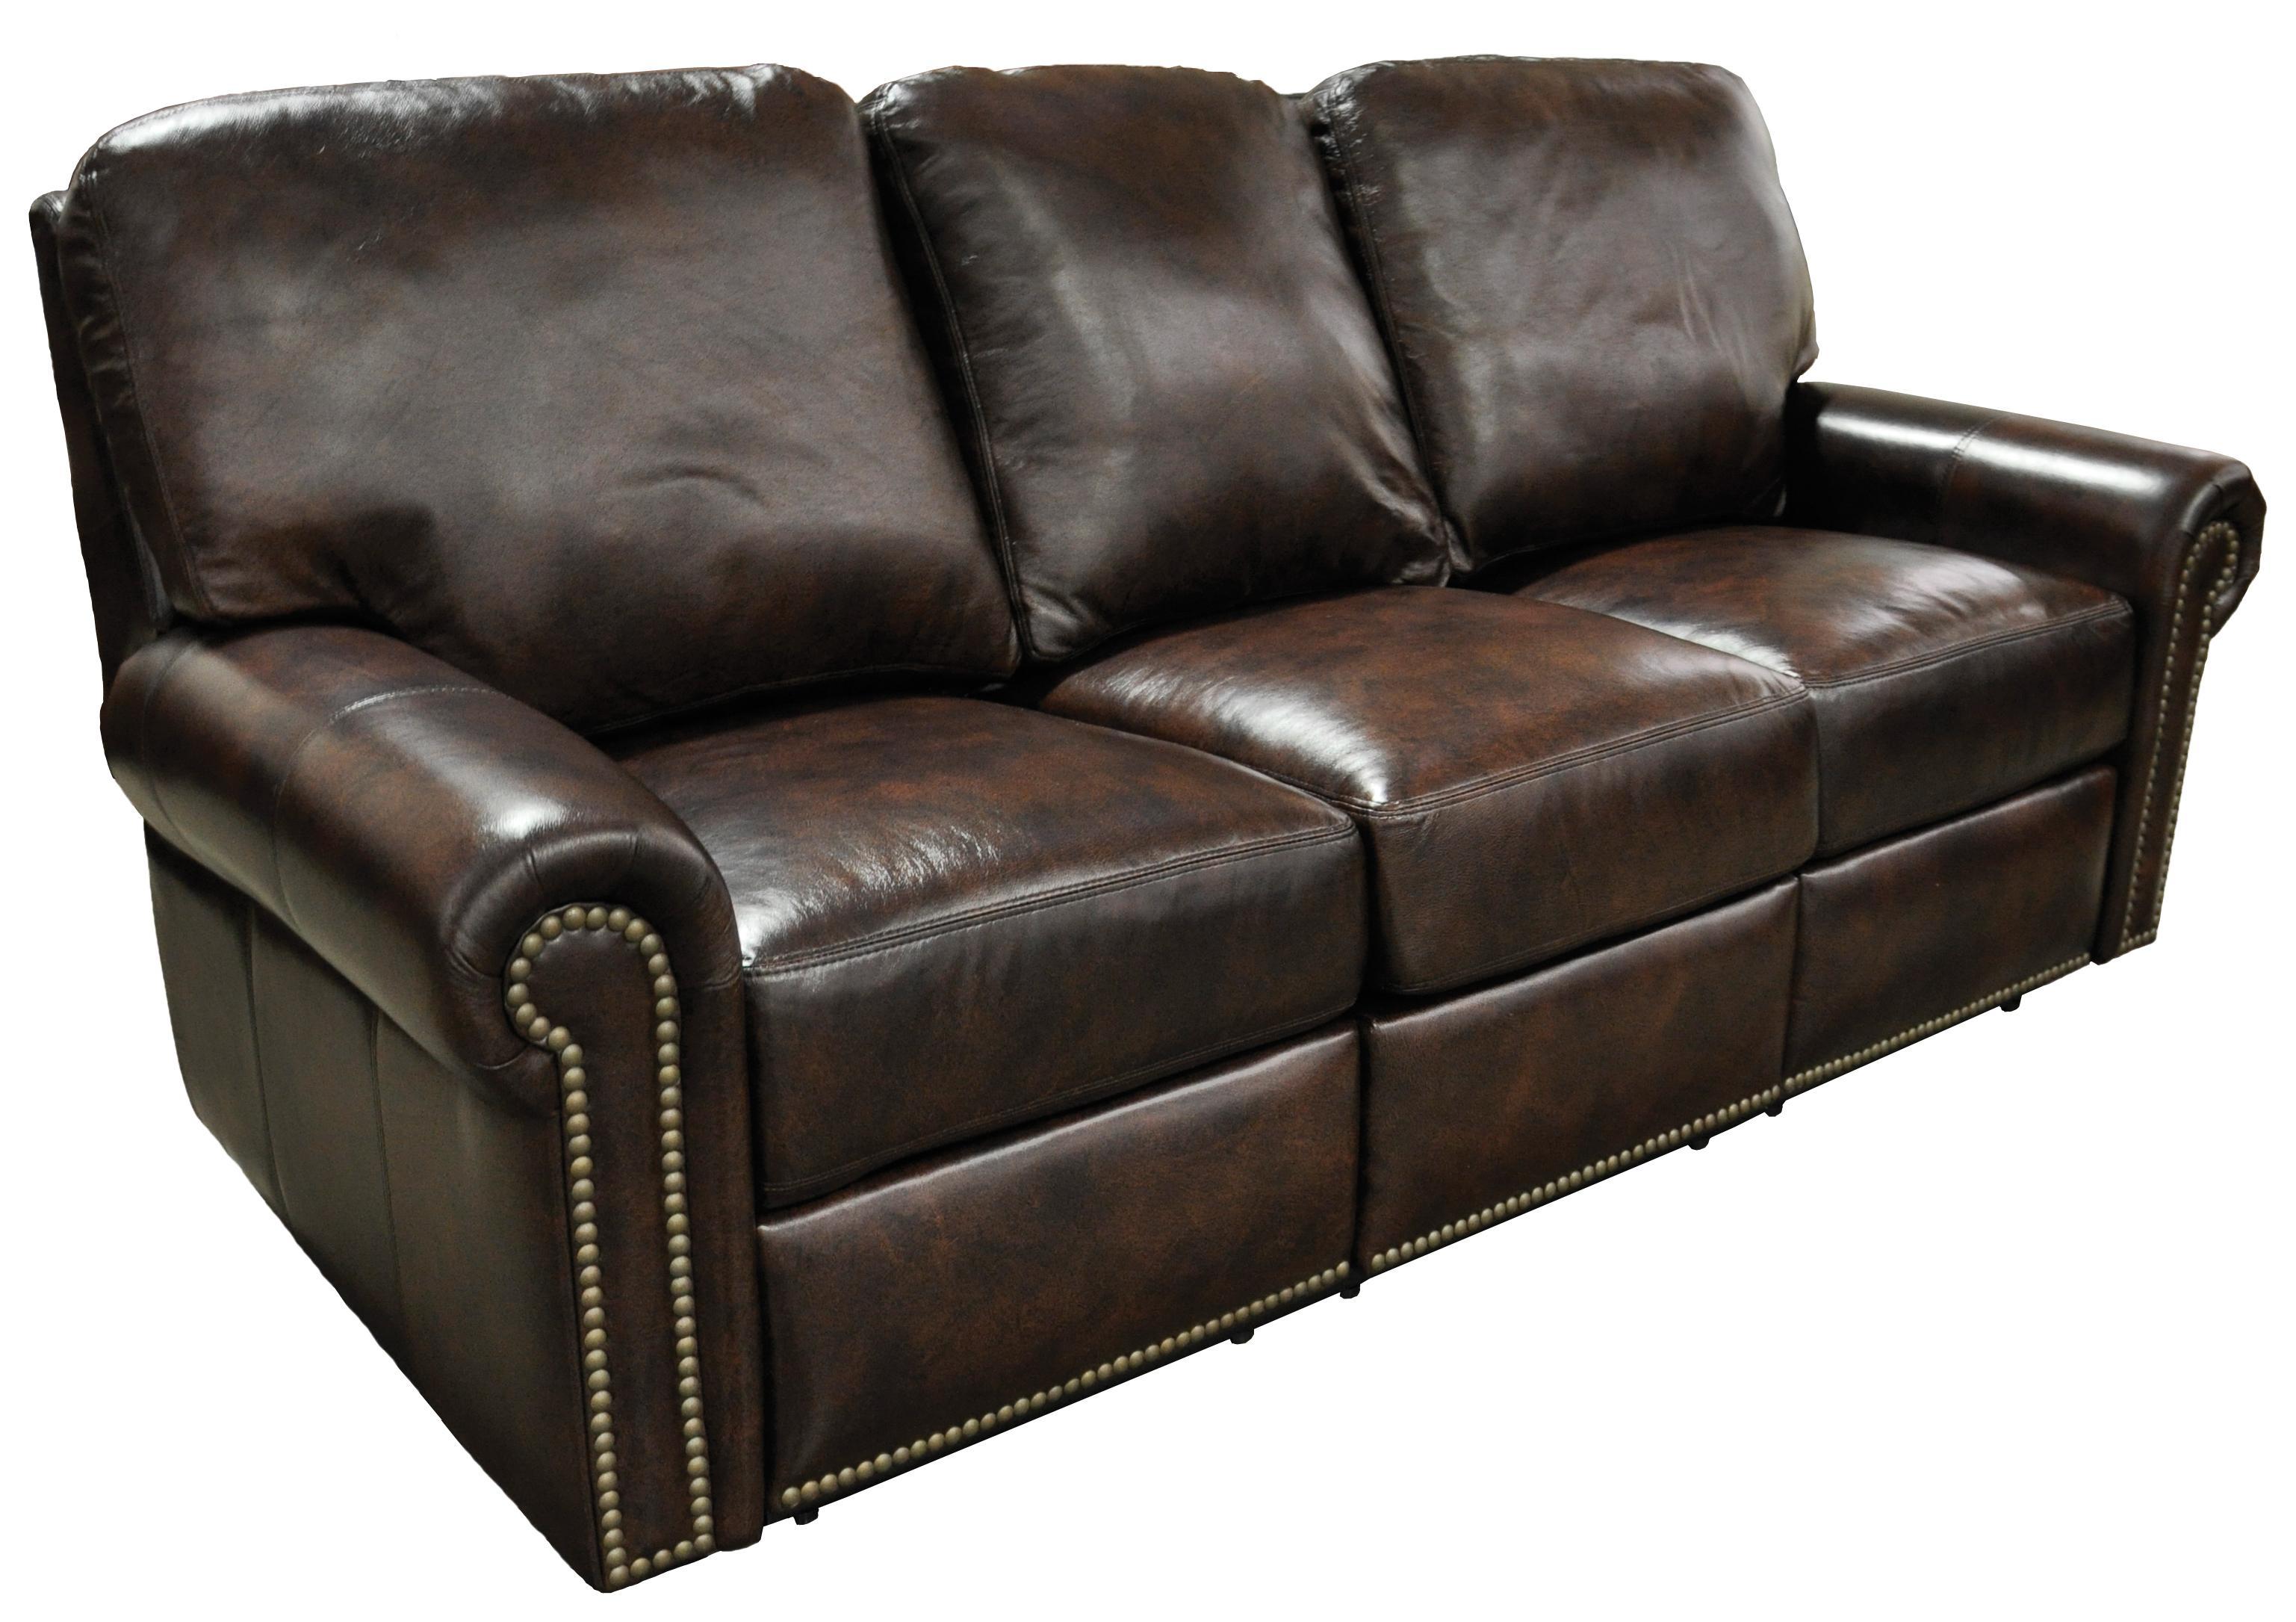 Sofas Center : Berkline Leather Reclinerofa Reviewset Costcoabine With Regard To Berkline Leather Recliner Sofas (Image 8 of 20)